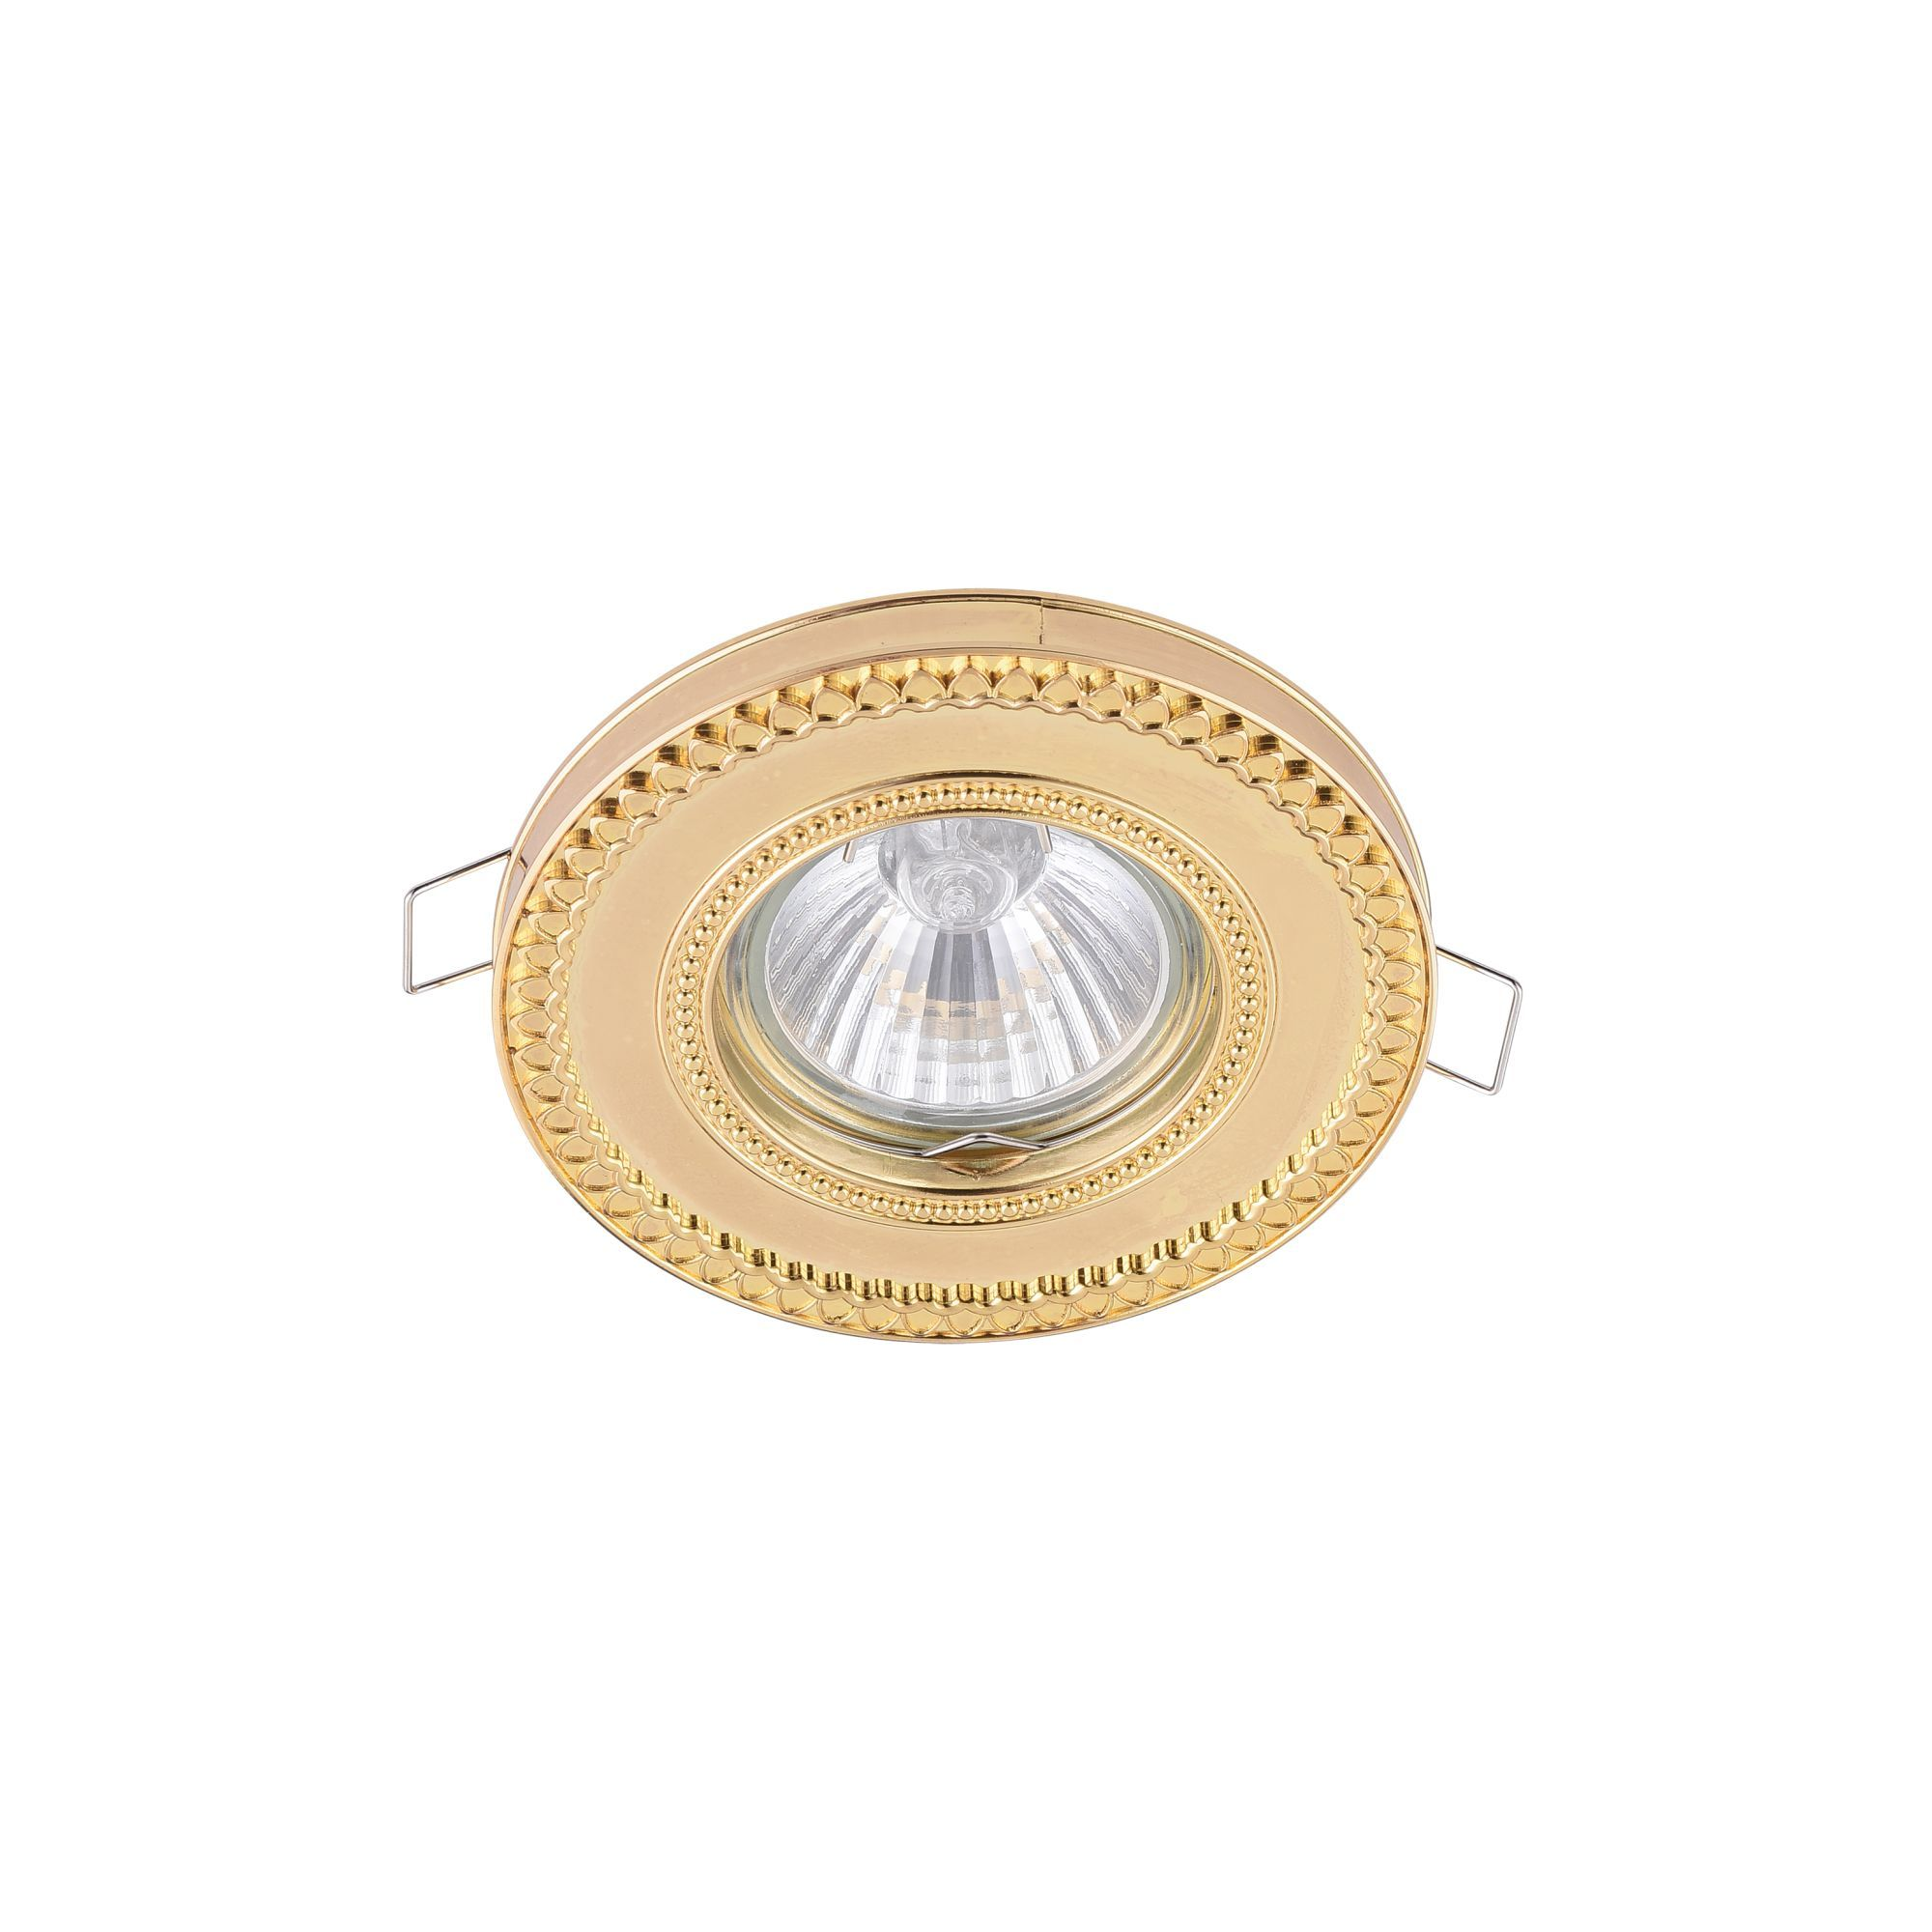 Встраиваемый светильник Maytoni Metal Classic DL302-2-01-G, 1xGU10x50W, золото, металл - фото 3